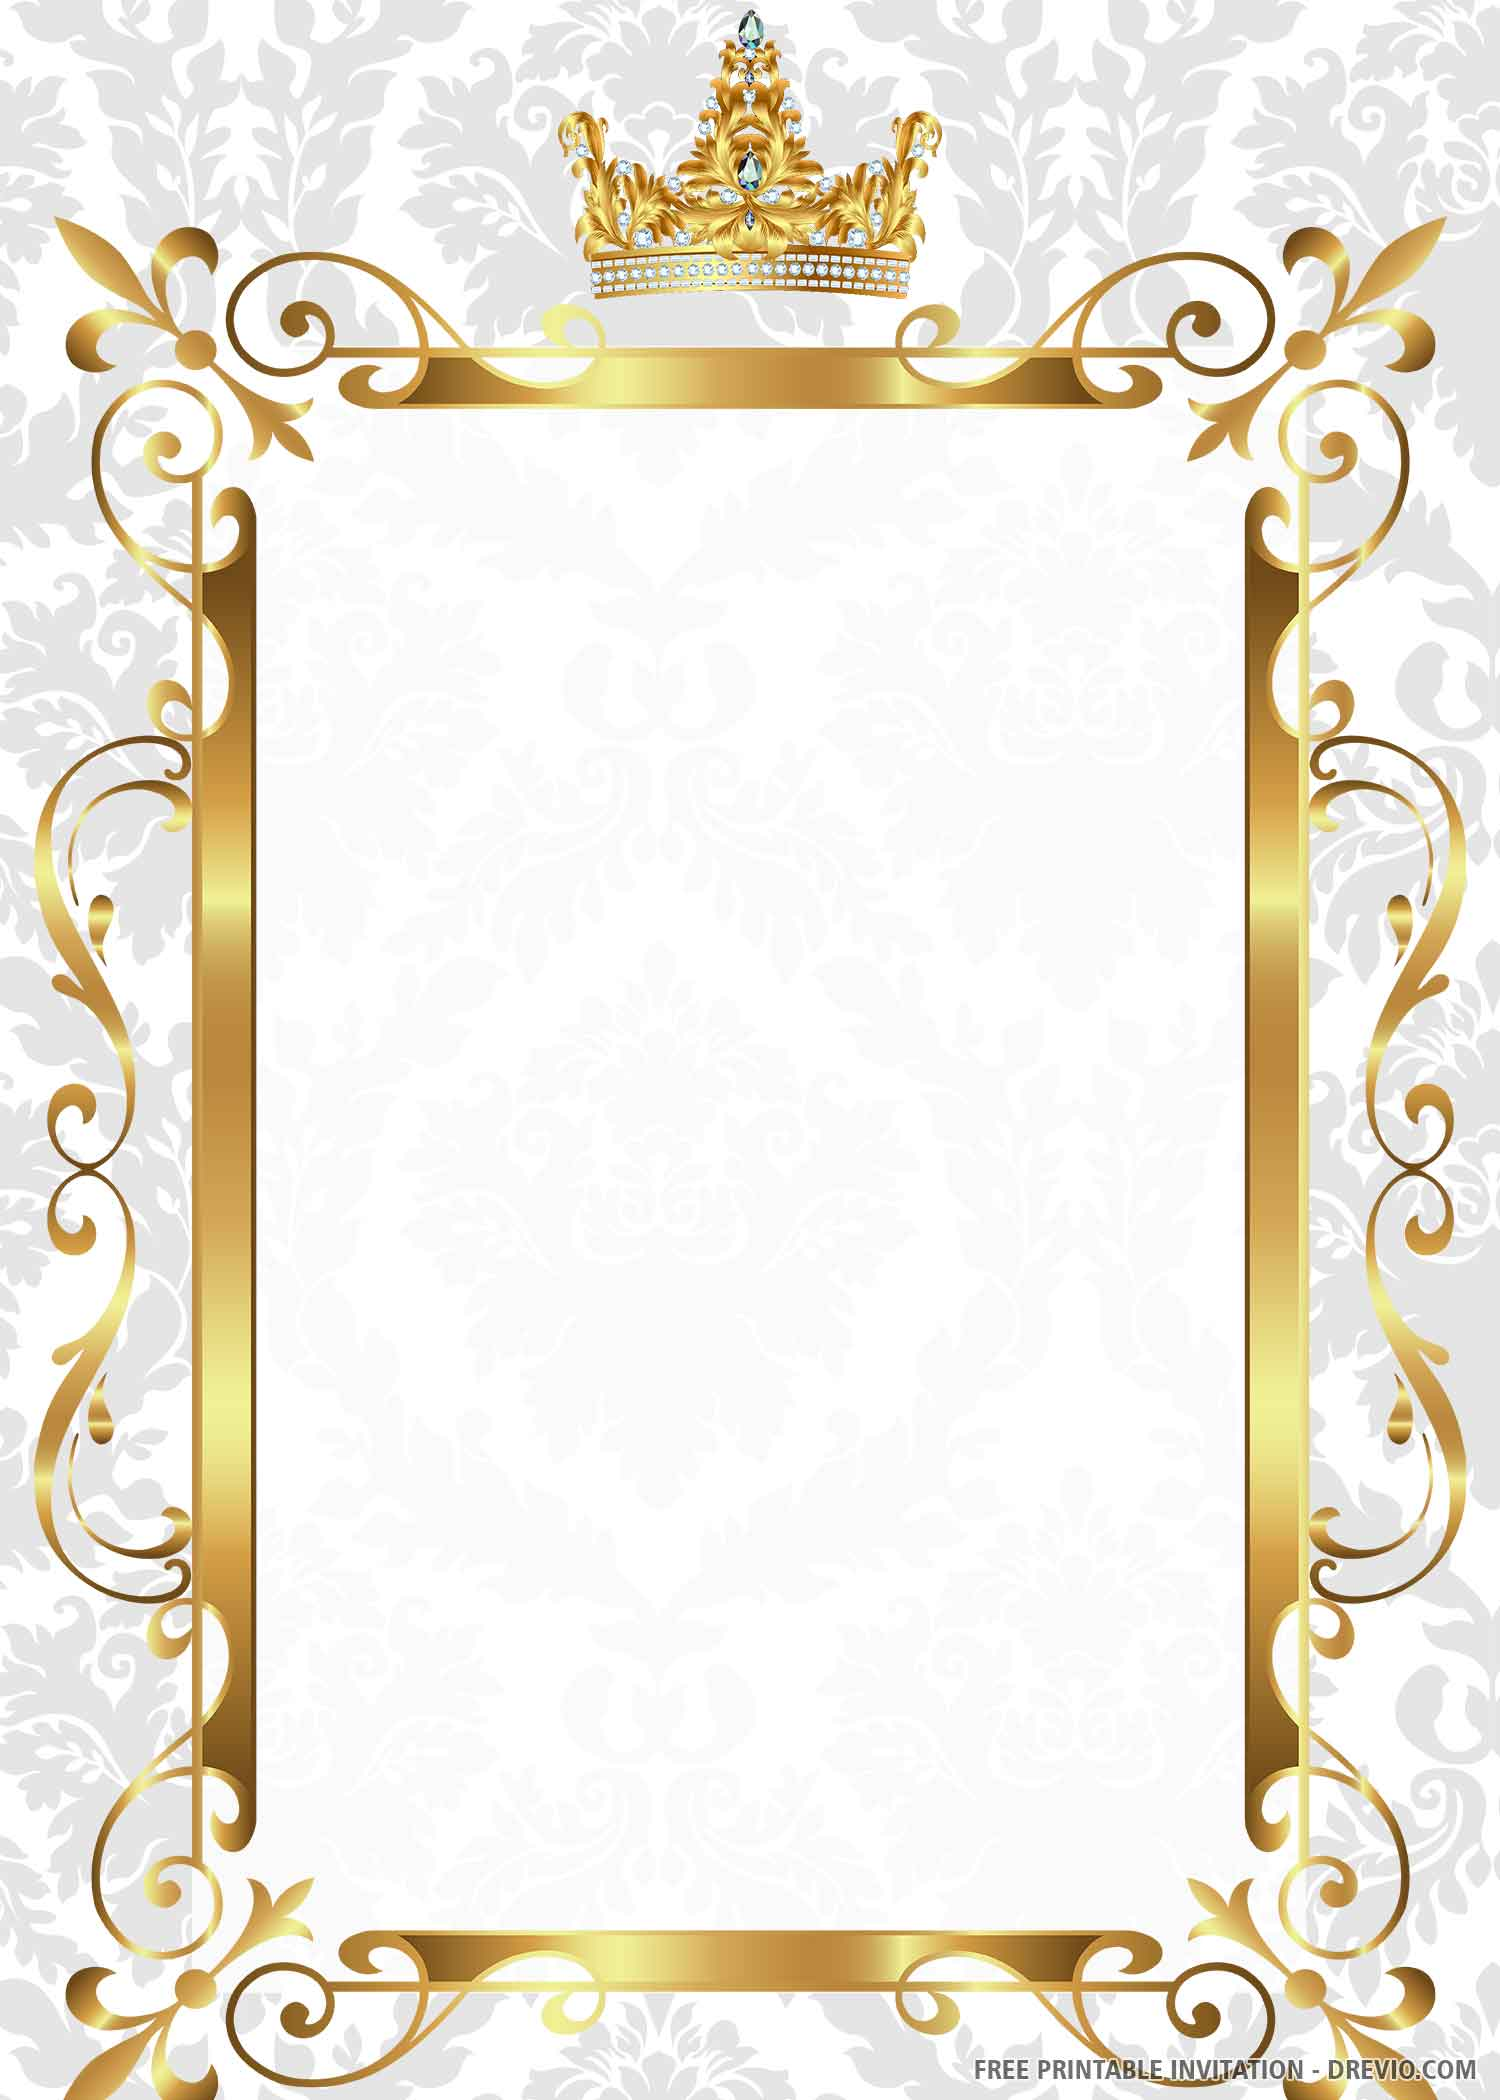 gold royal wedding invitation templates